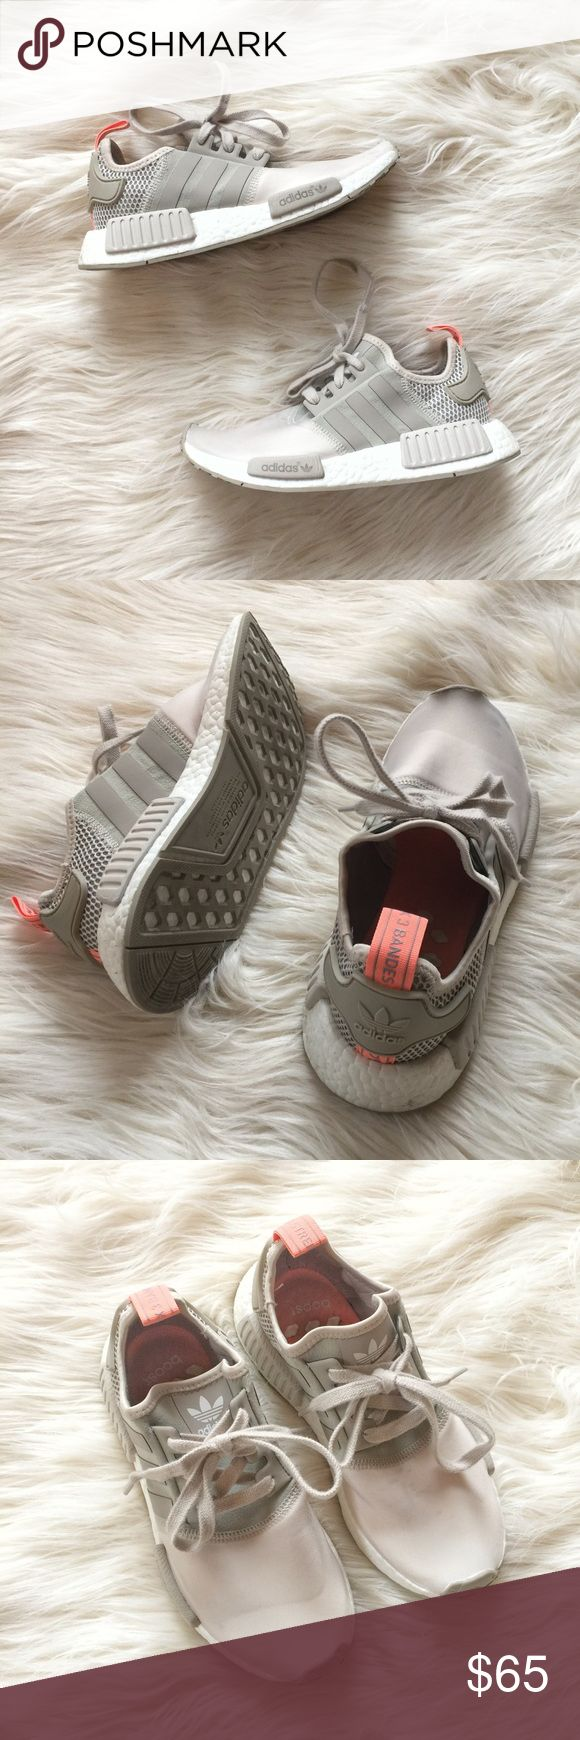 adidas nmd runner primeknit adidas nmd xr1 women 65